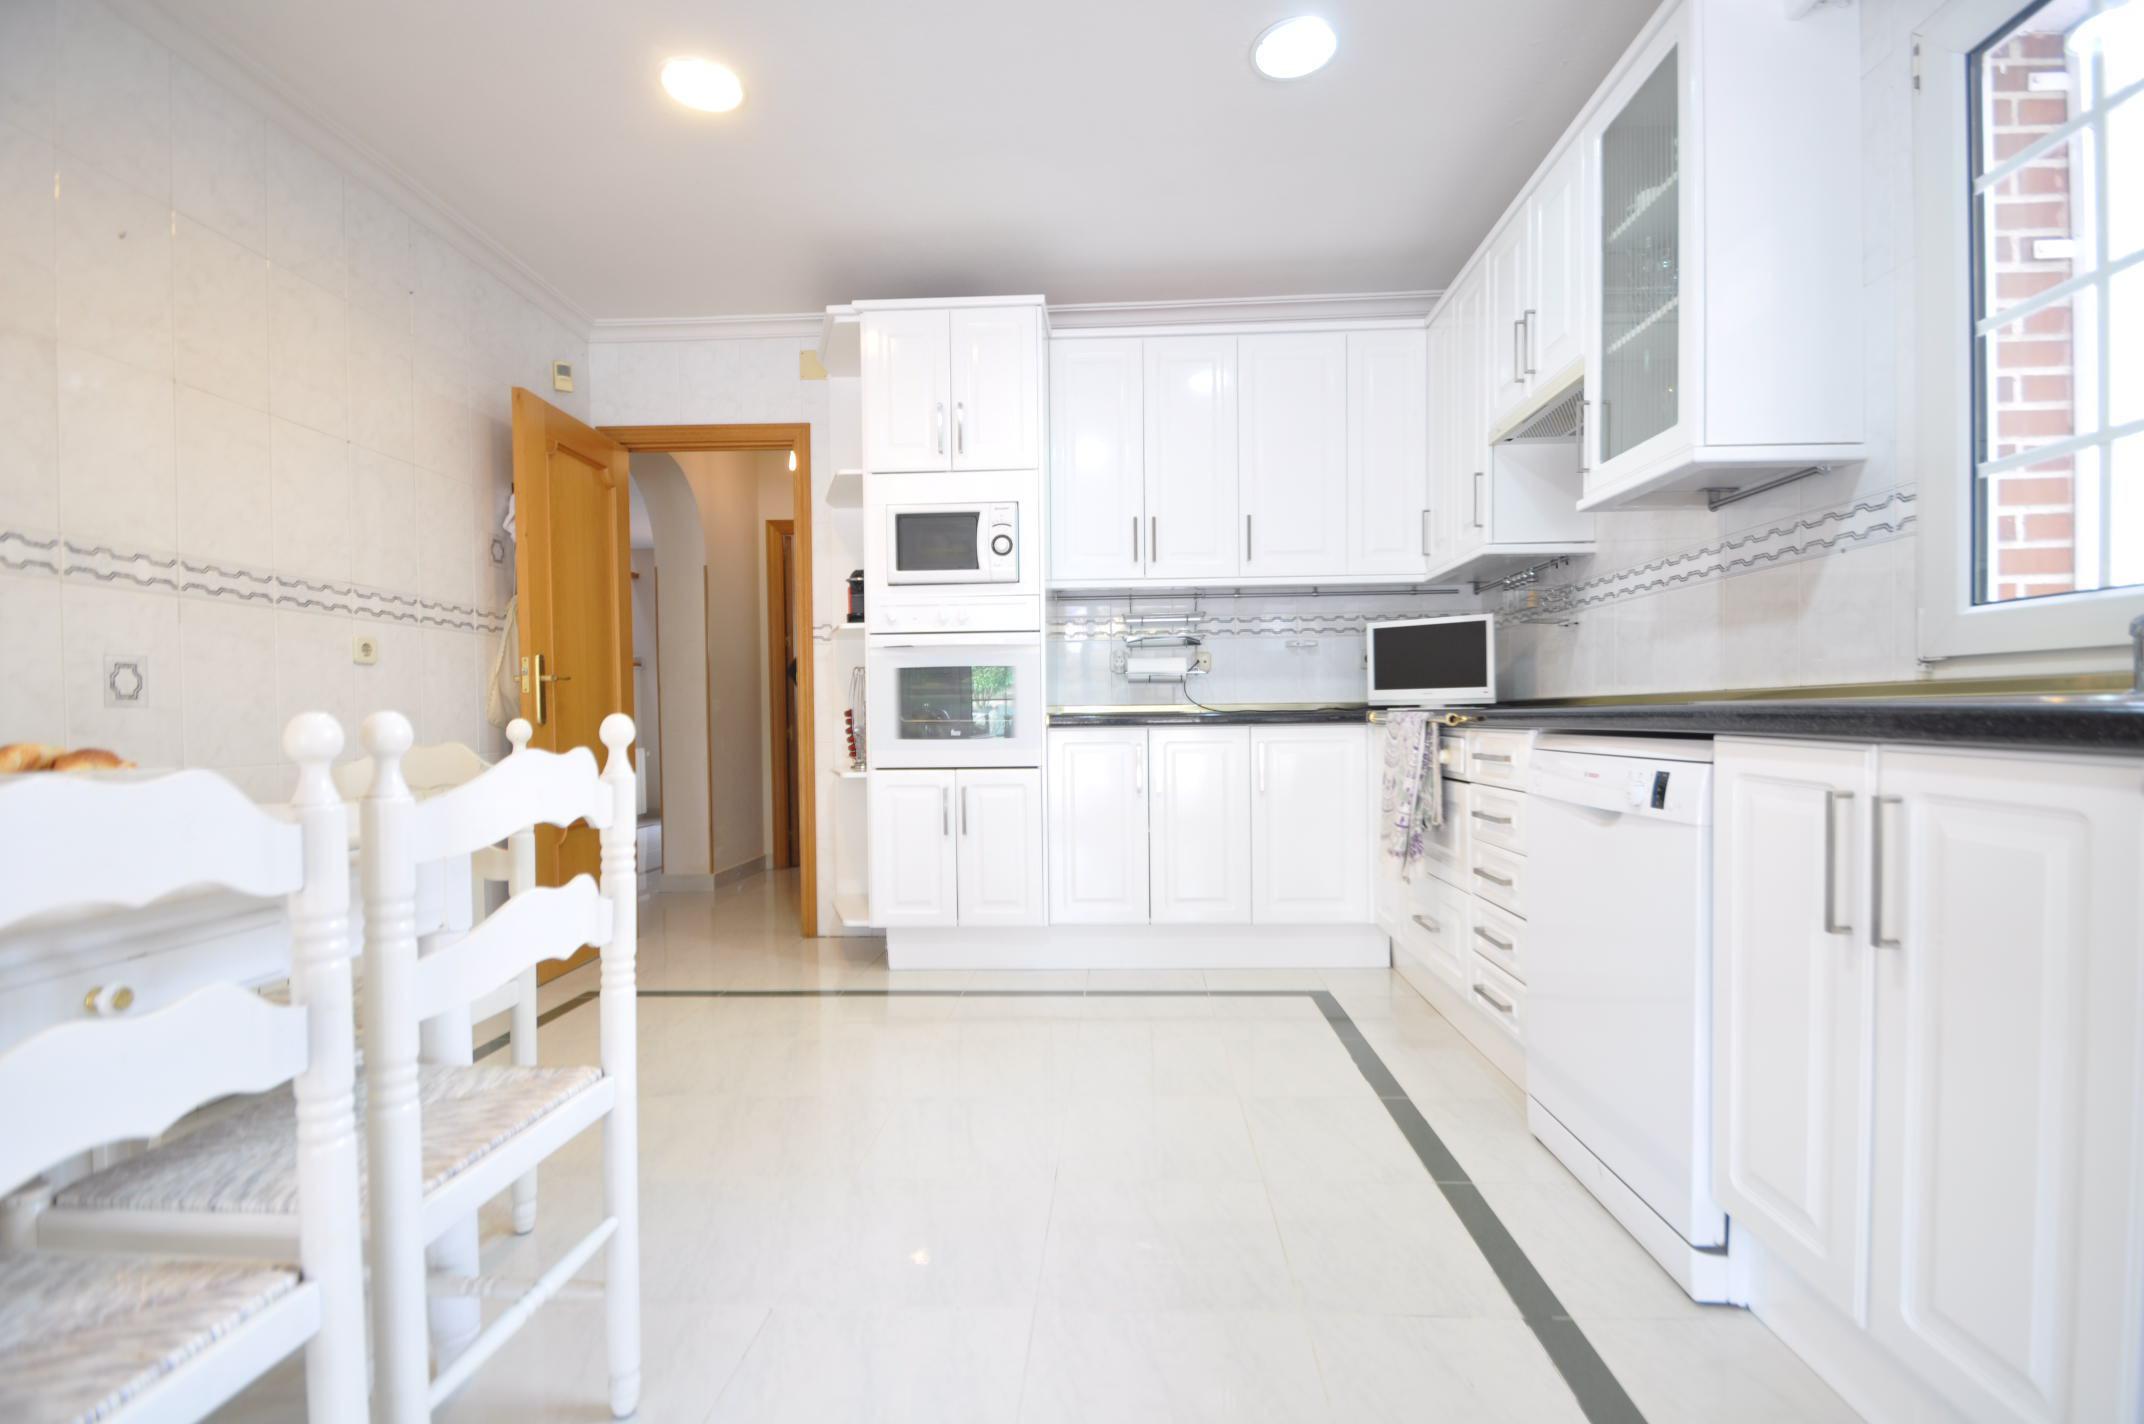 Poner mi piso en alquiler perfect avenida de la - Poner piso en alquiler ...